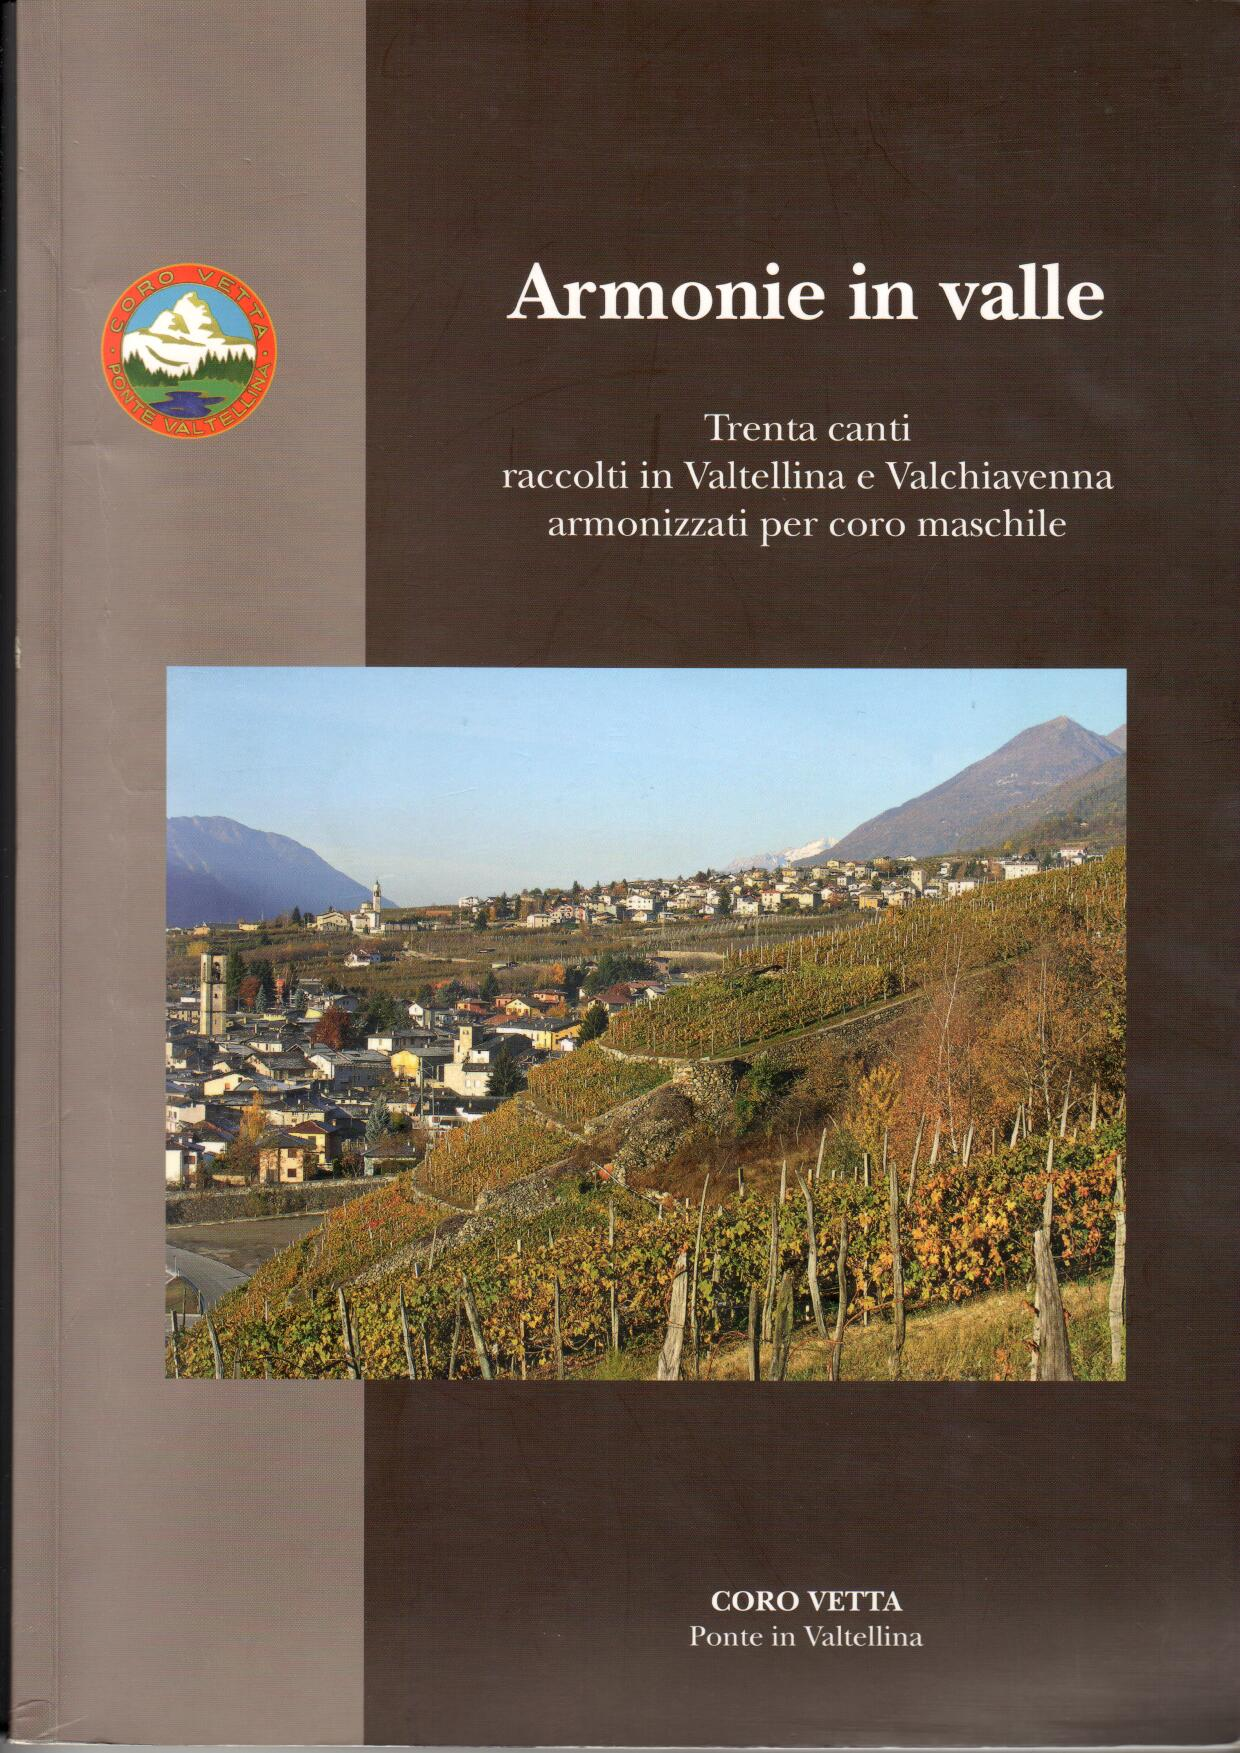 Armonie in valle